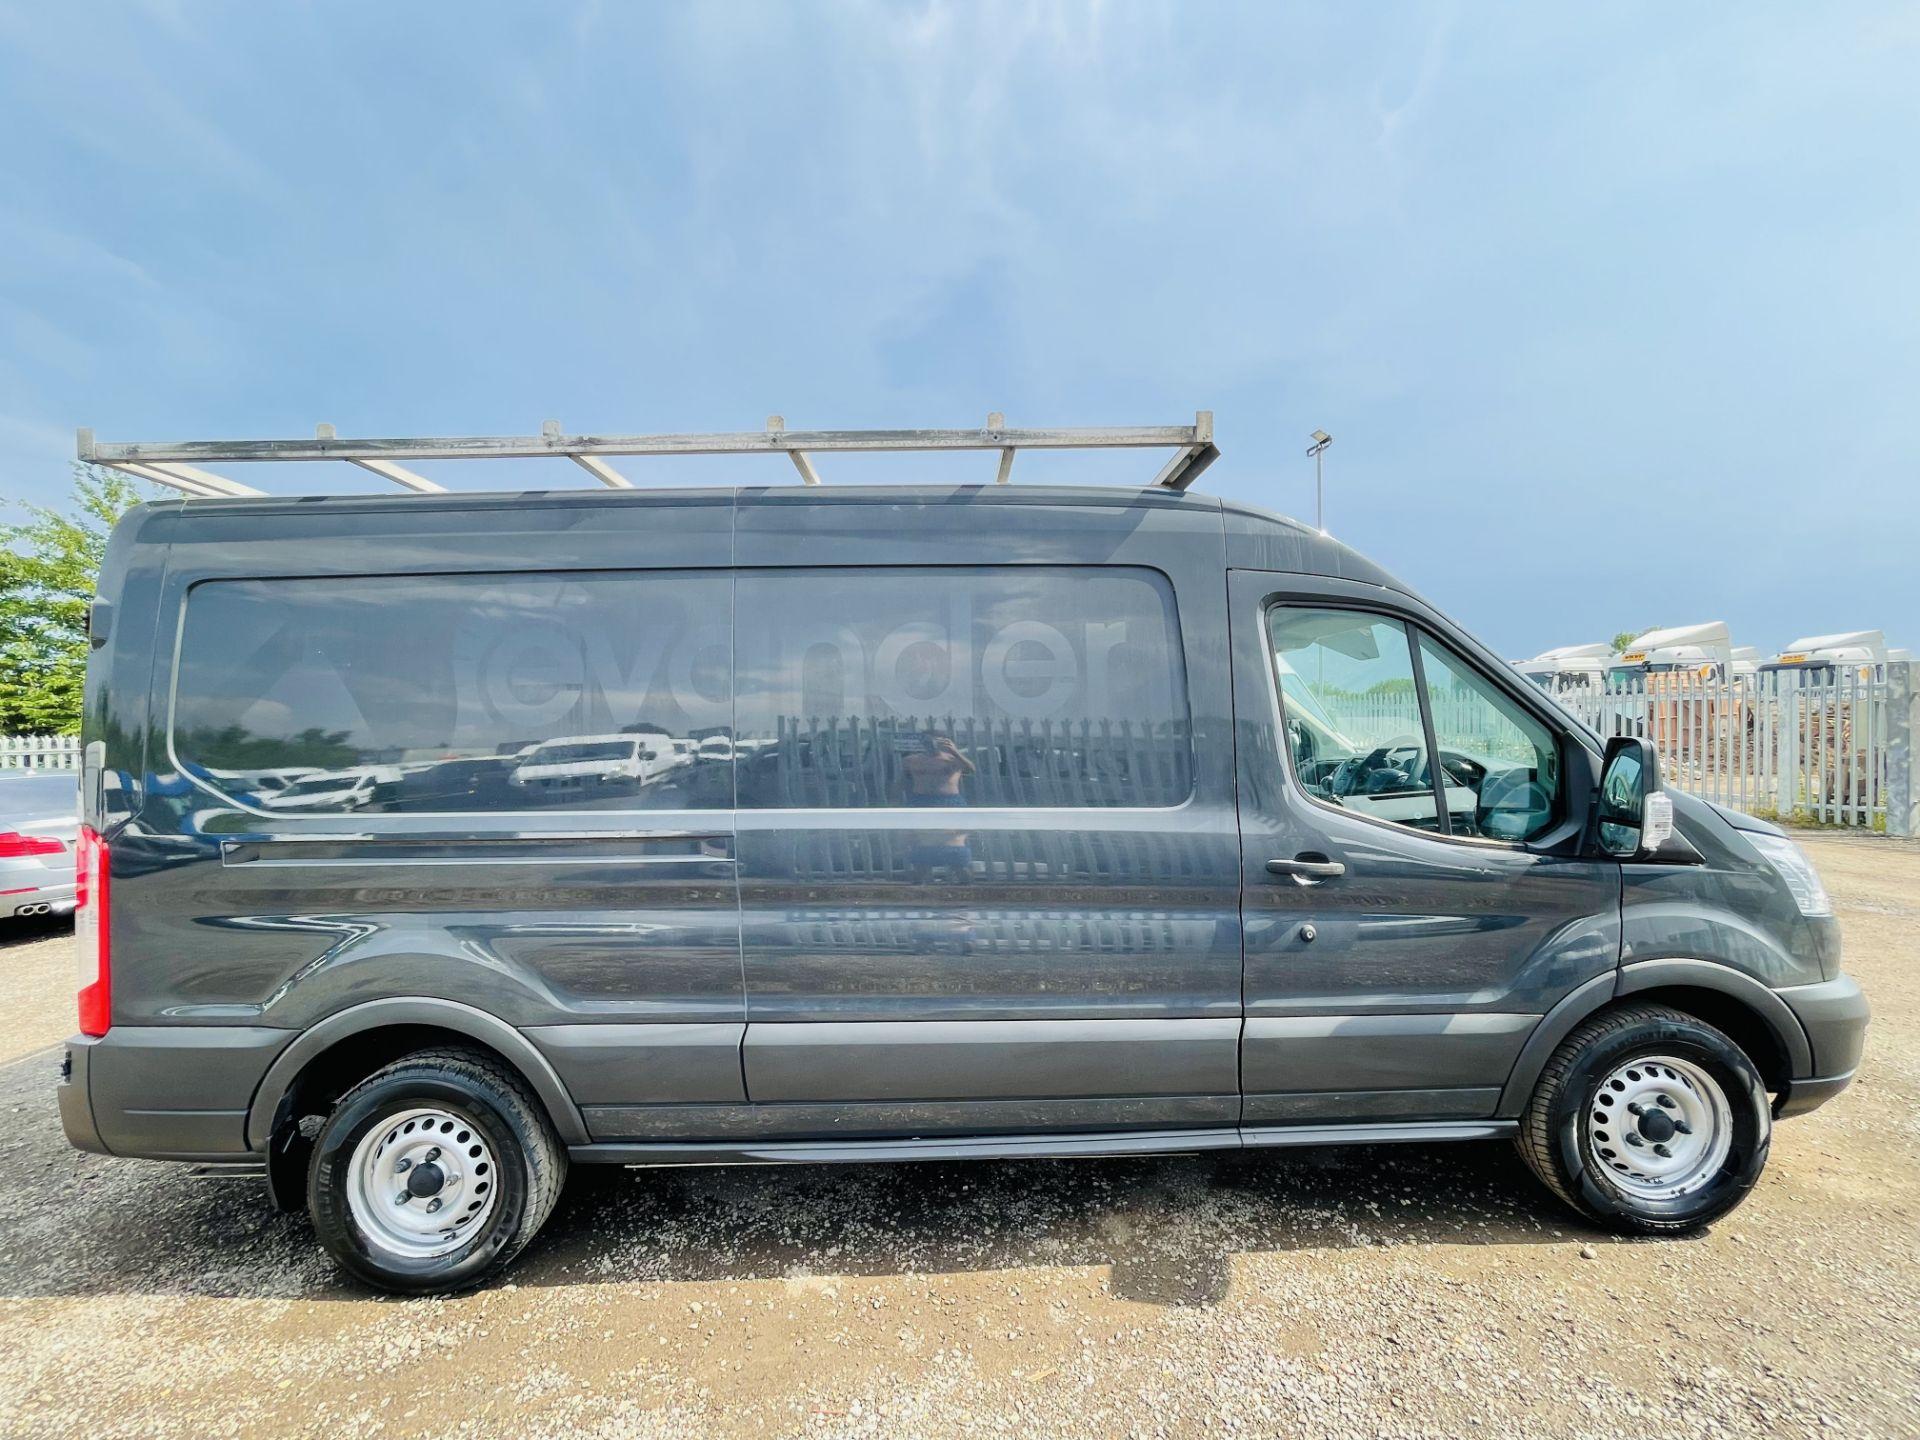 Ford Transit 2.2 TDCI 100 L3 H2 T350 2015 '65 Reg' - Panel Van - LCV - Grey - Image 11 of 14